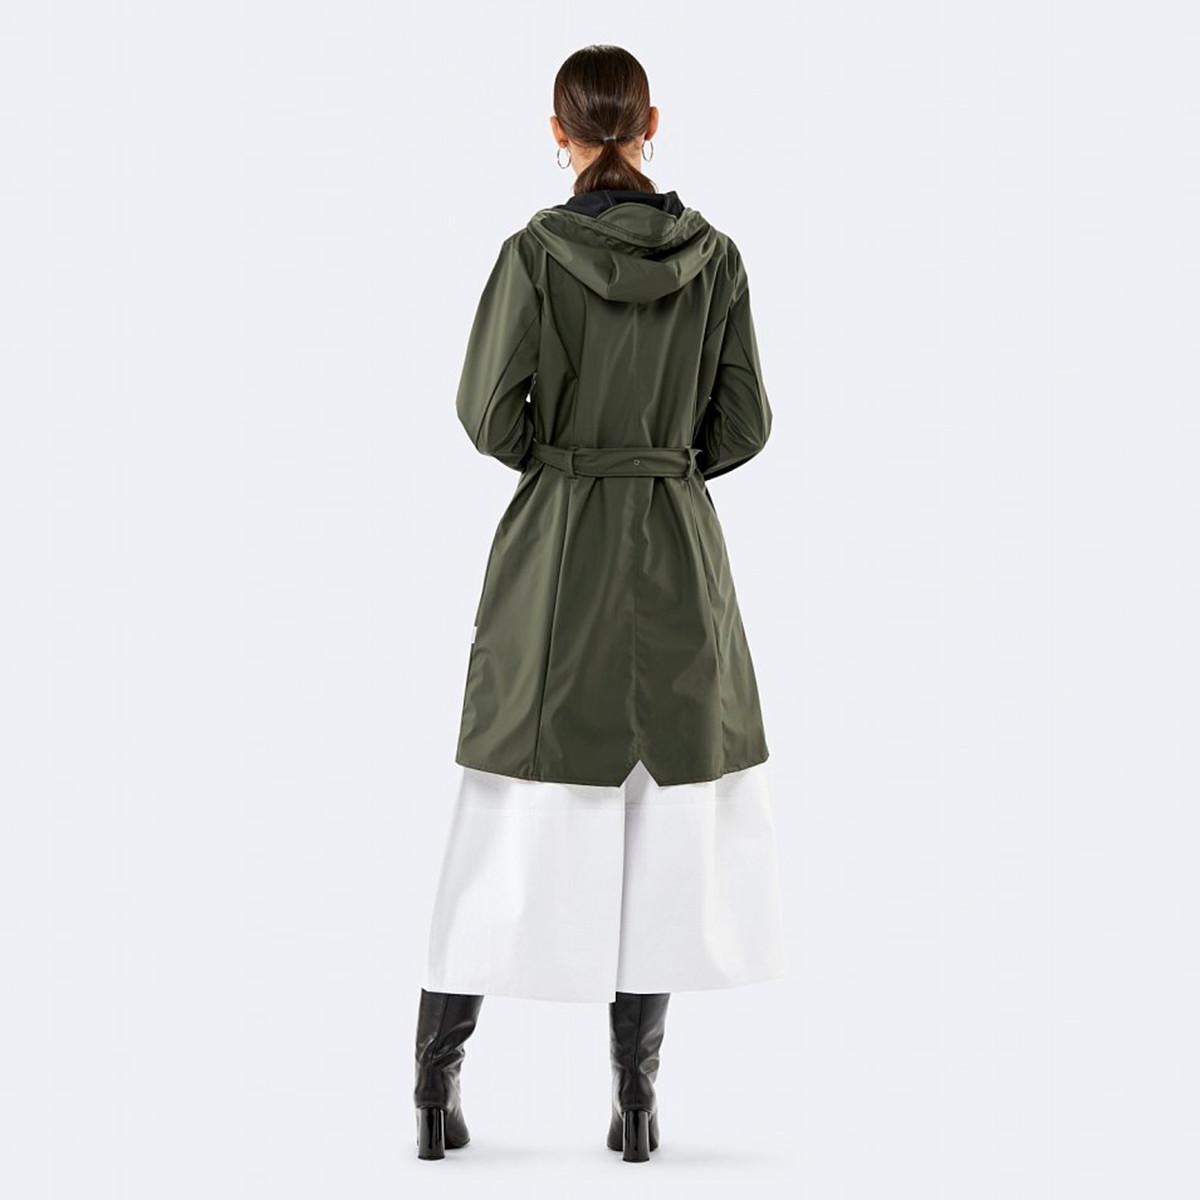 8920887490f 1206 Curve regnjakke grøn - Rains | Rikke Solberg